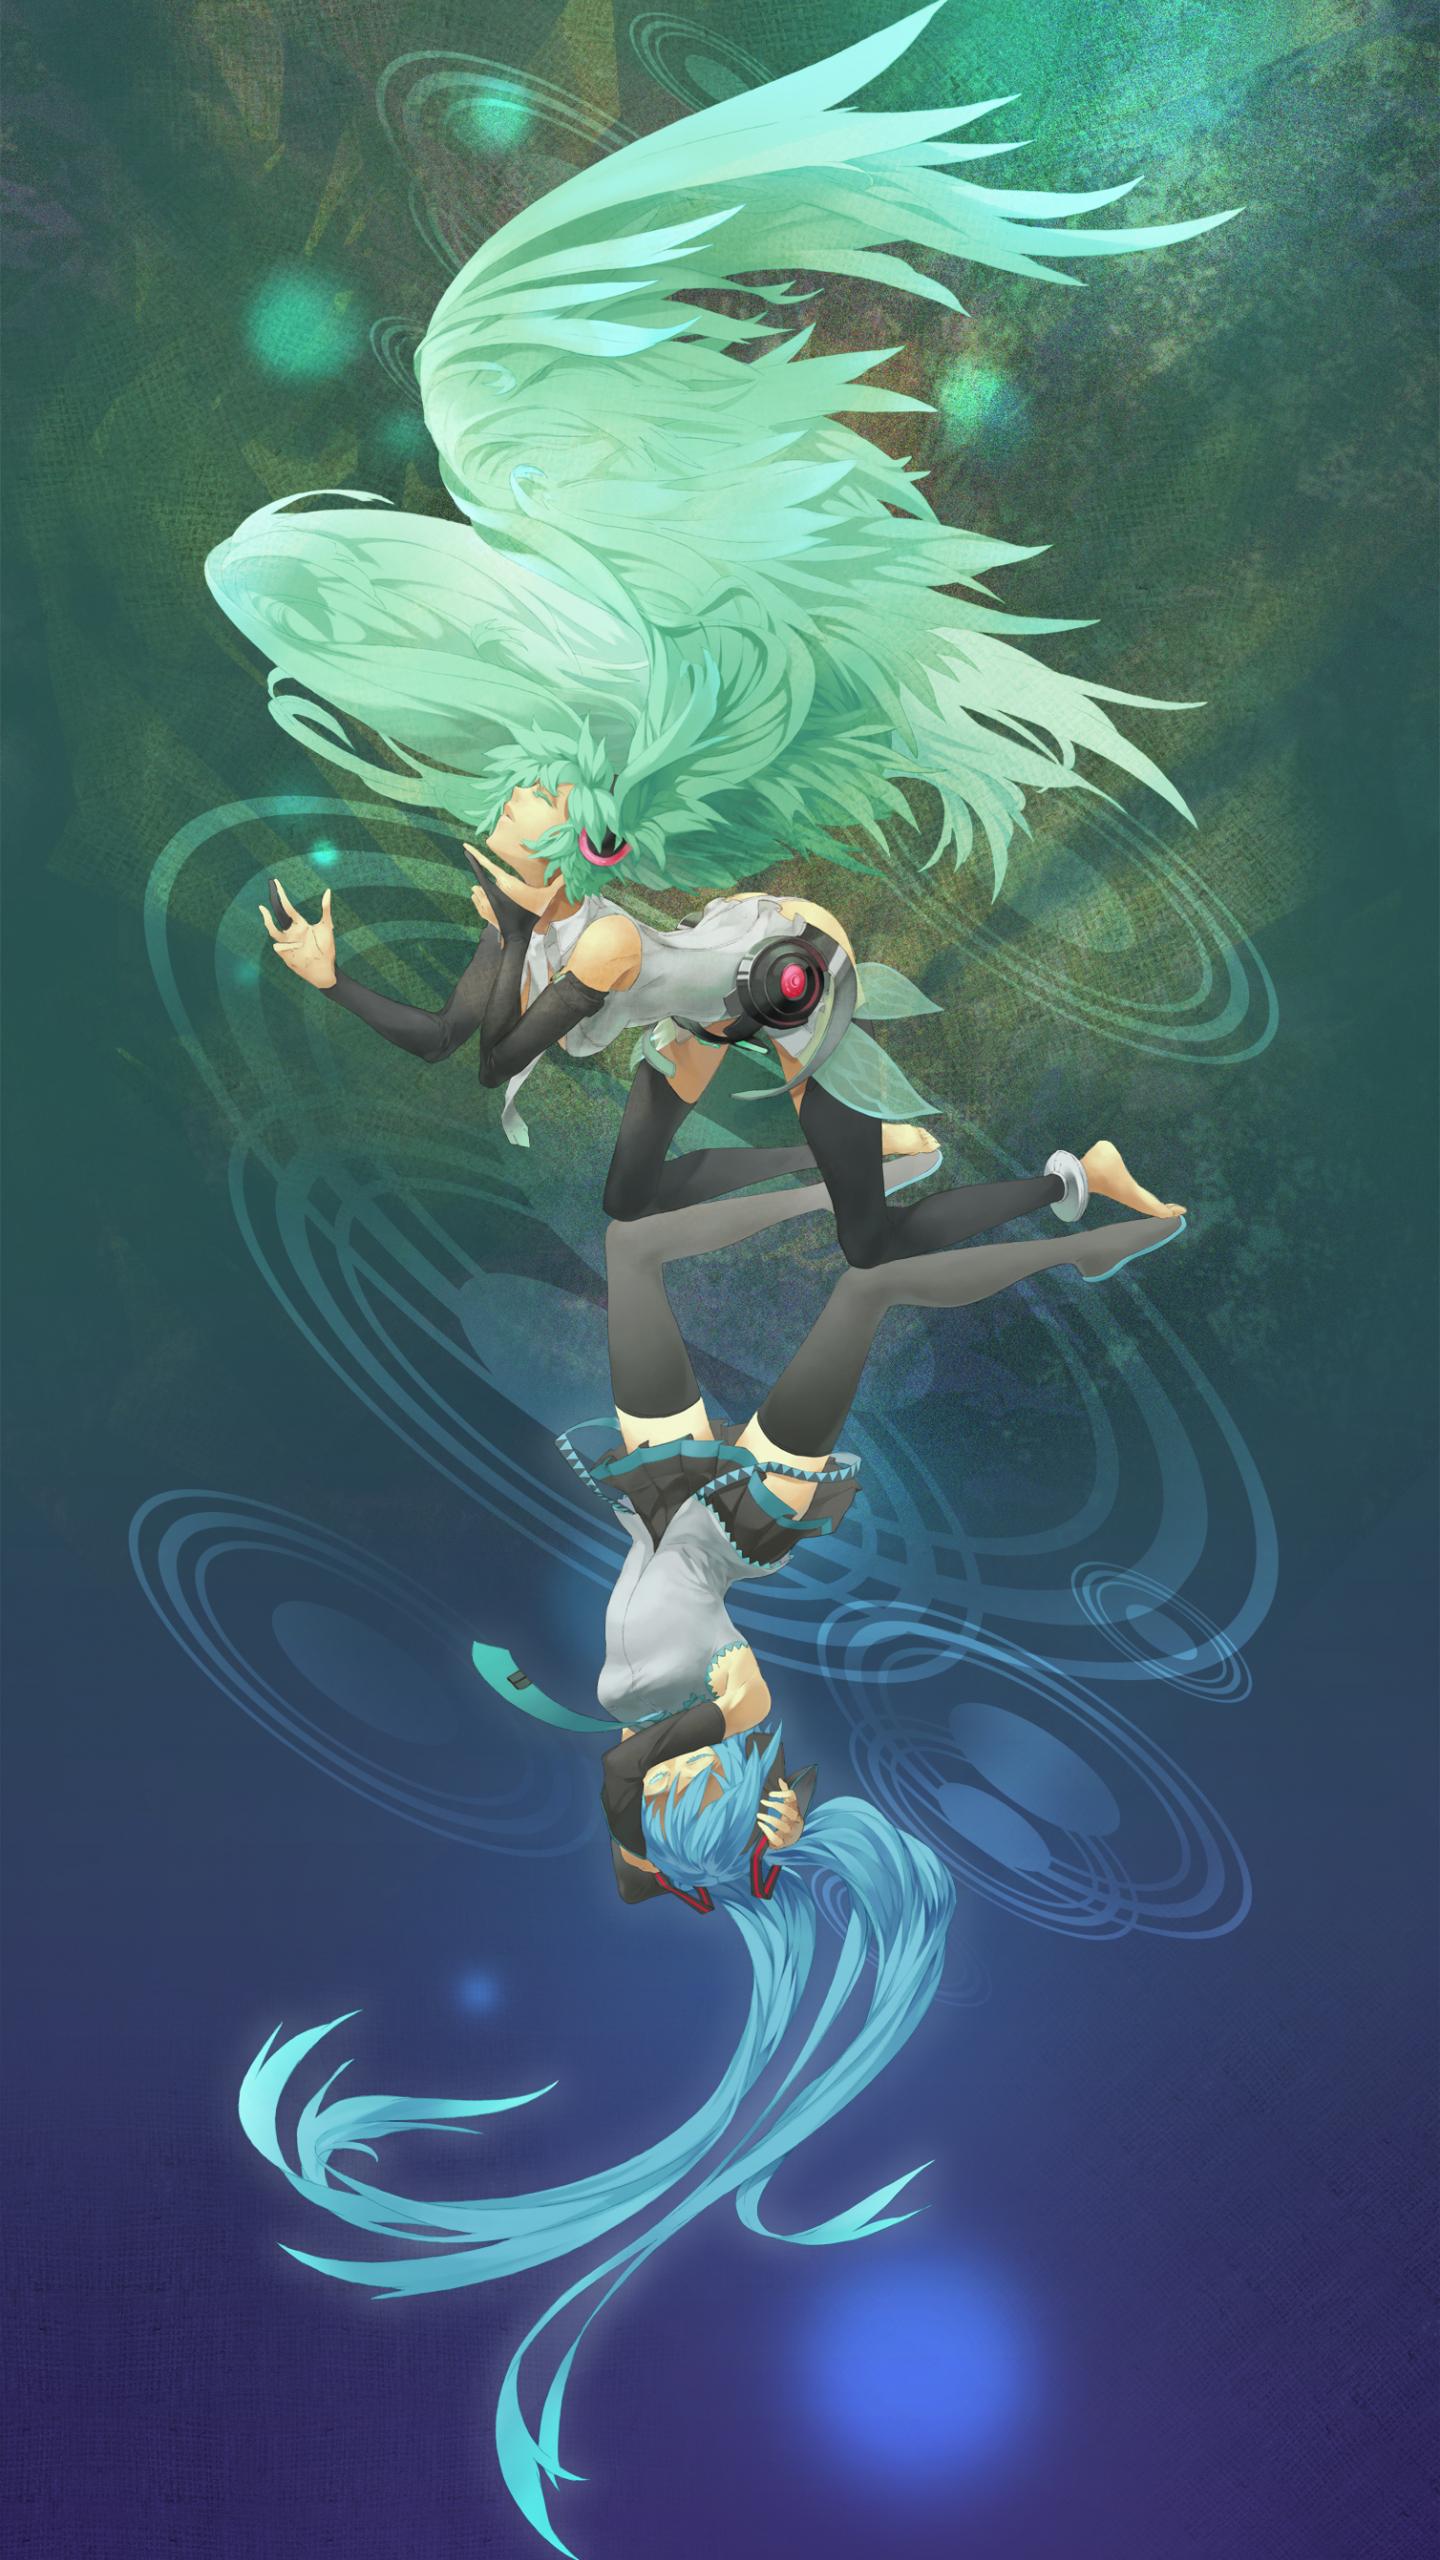 Free Download Vocaloid Hatsune Miku Vertical Miku Append Anime